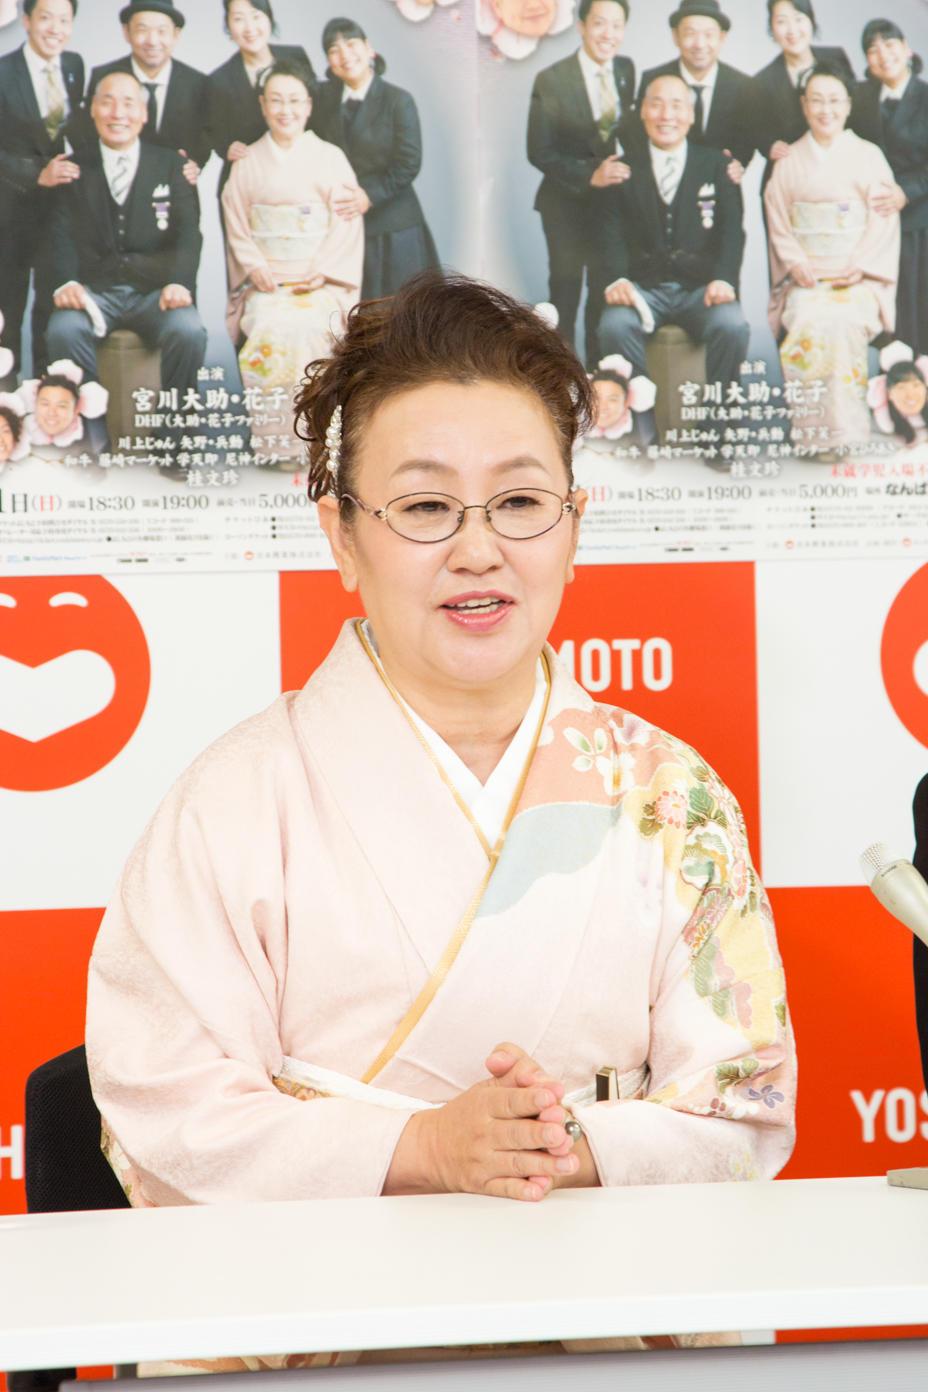 http://news.yoshimoto.co.jp/20180116115223-42fa2617a49150f8eddb108333f082ae79666172.jpg